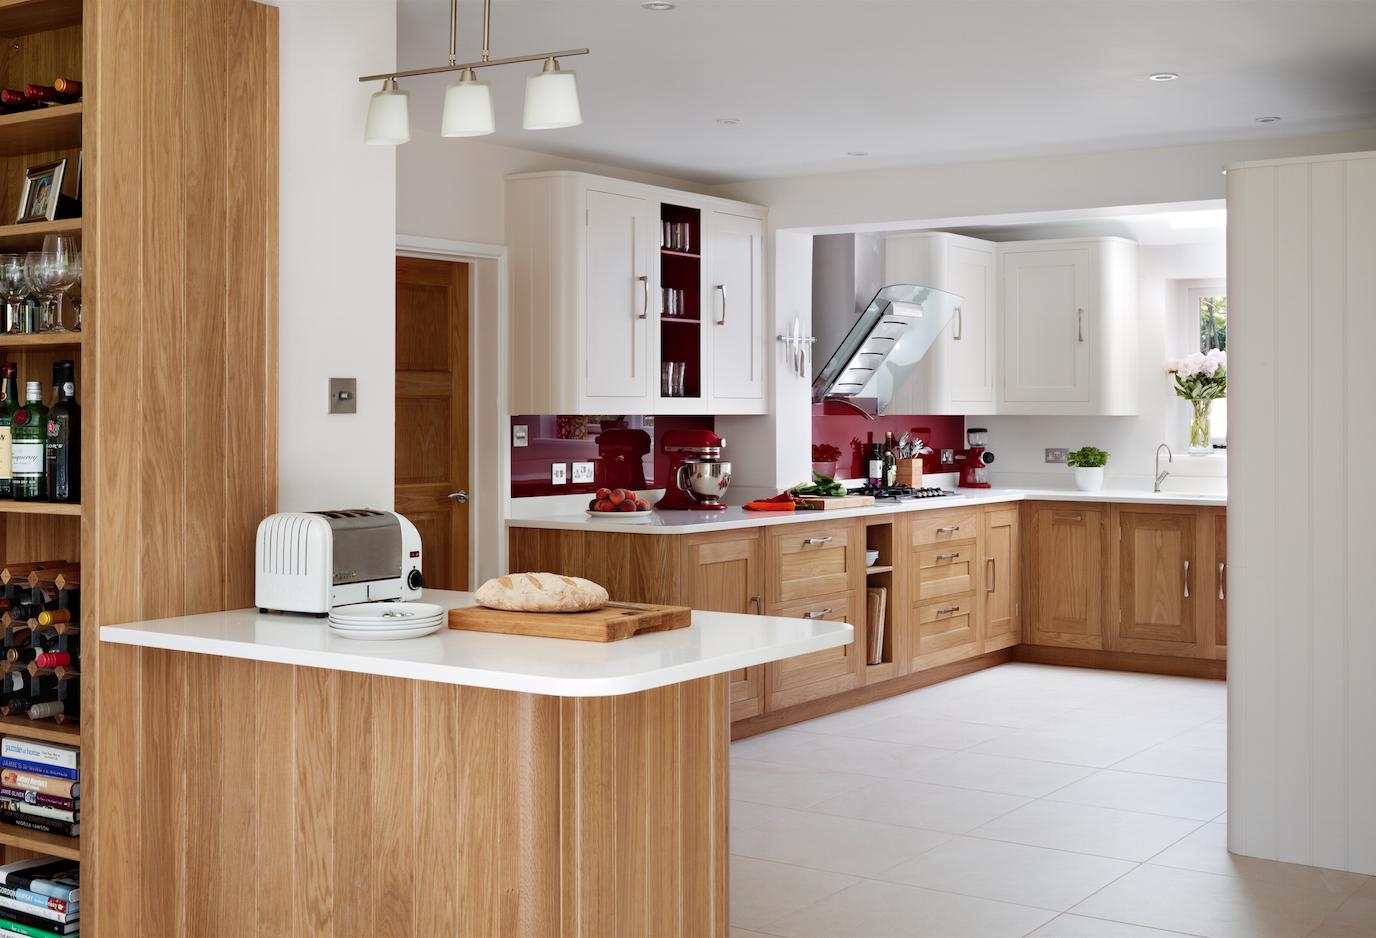 Harvey Jones Shaker Kitchen With Oak Base Cupboards Shaker Kitchen Shaker Style Kitchens Granite Countertops Kitchen